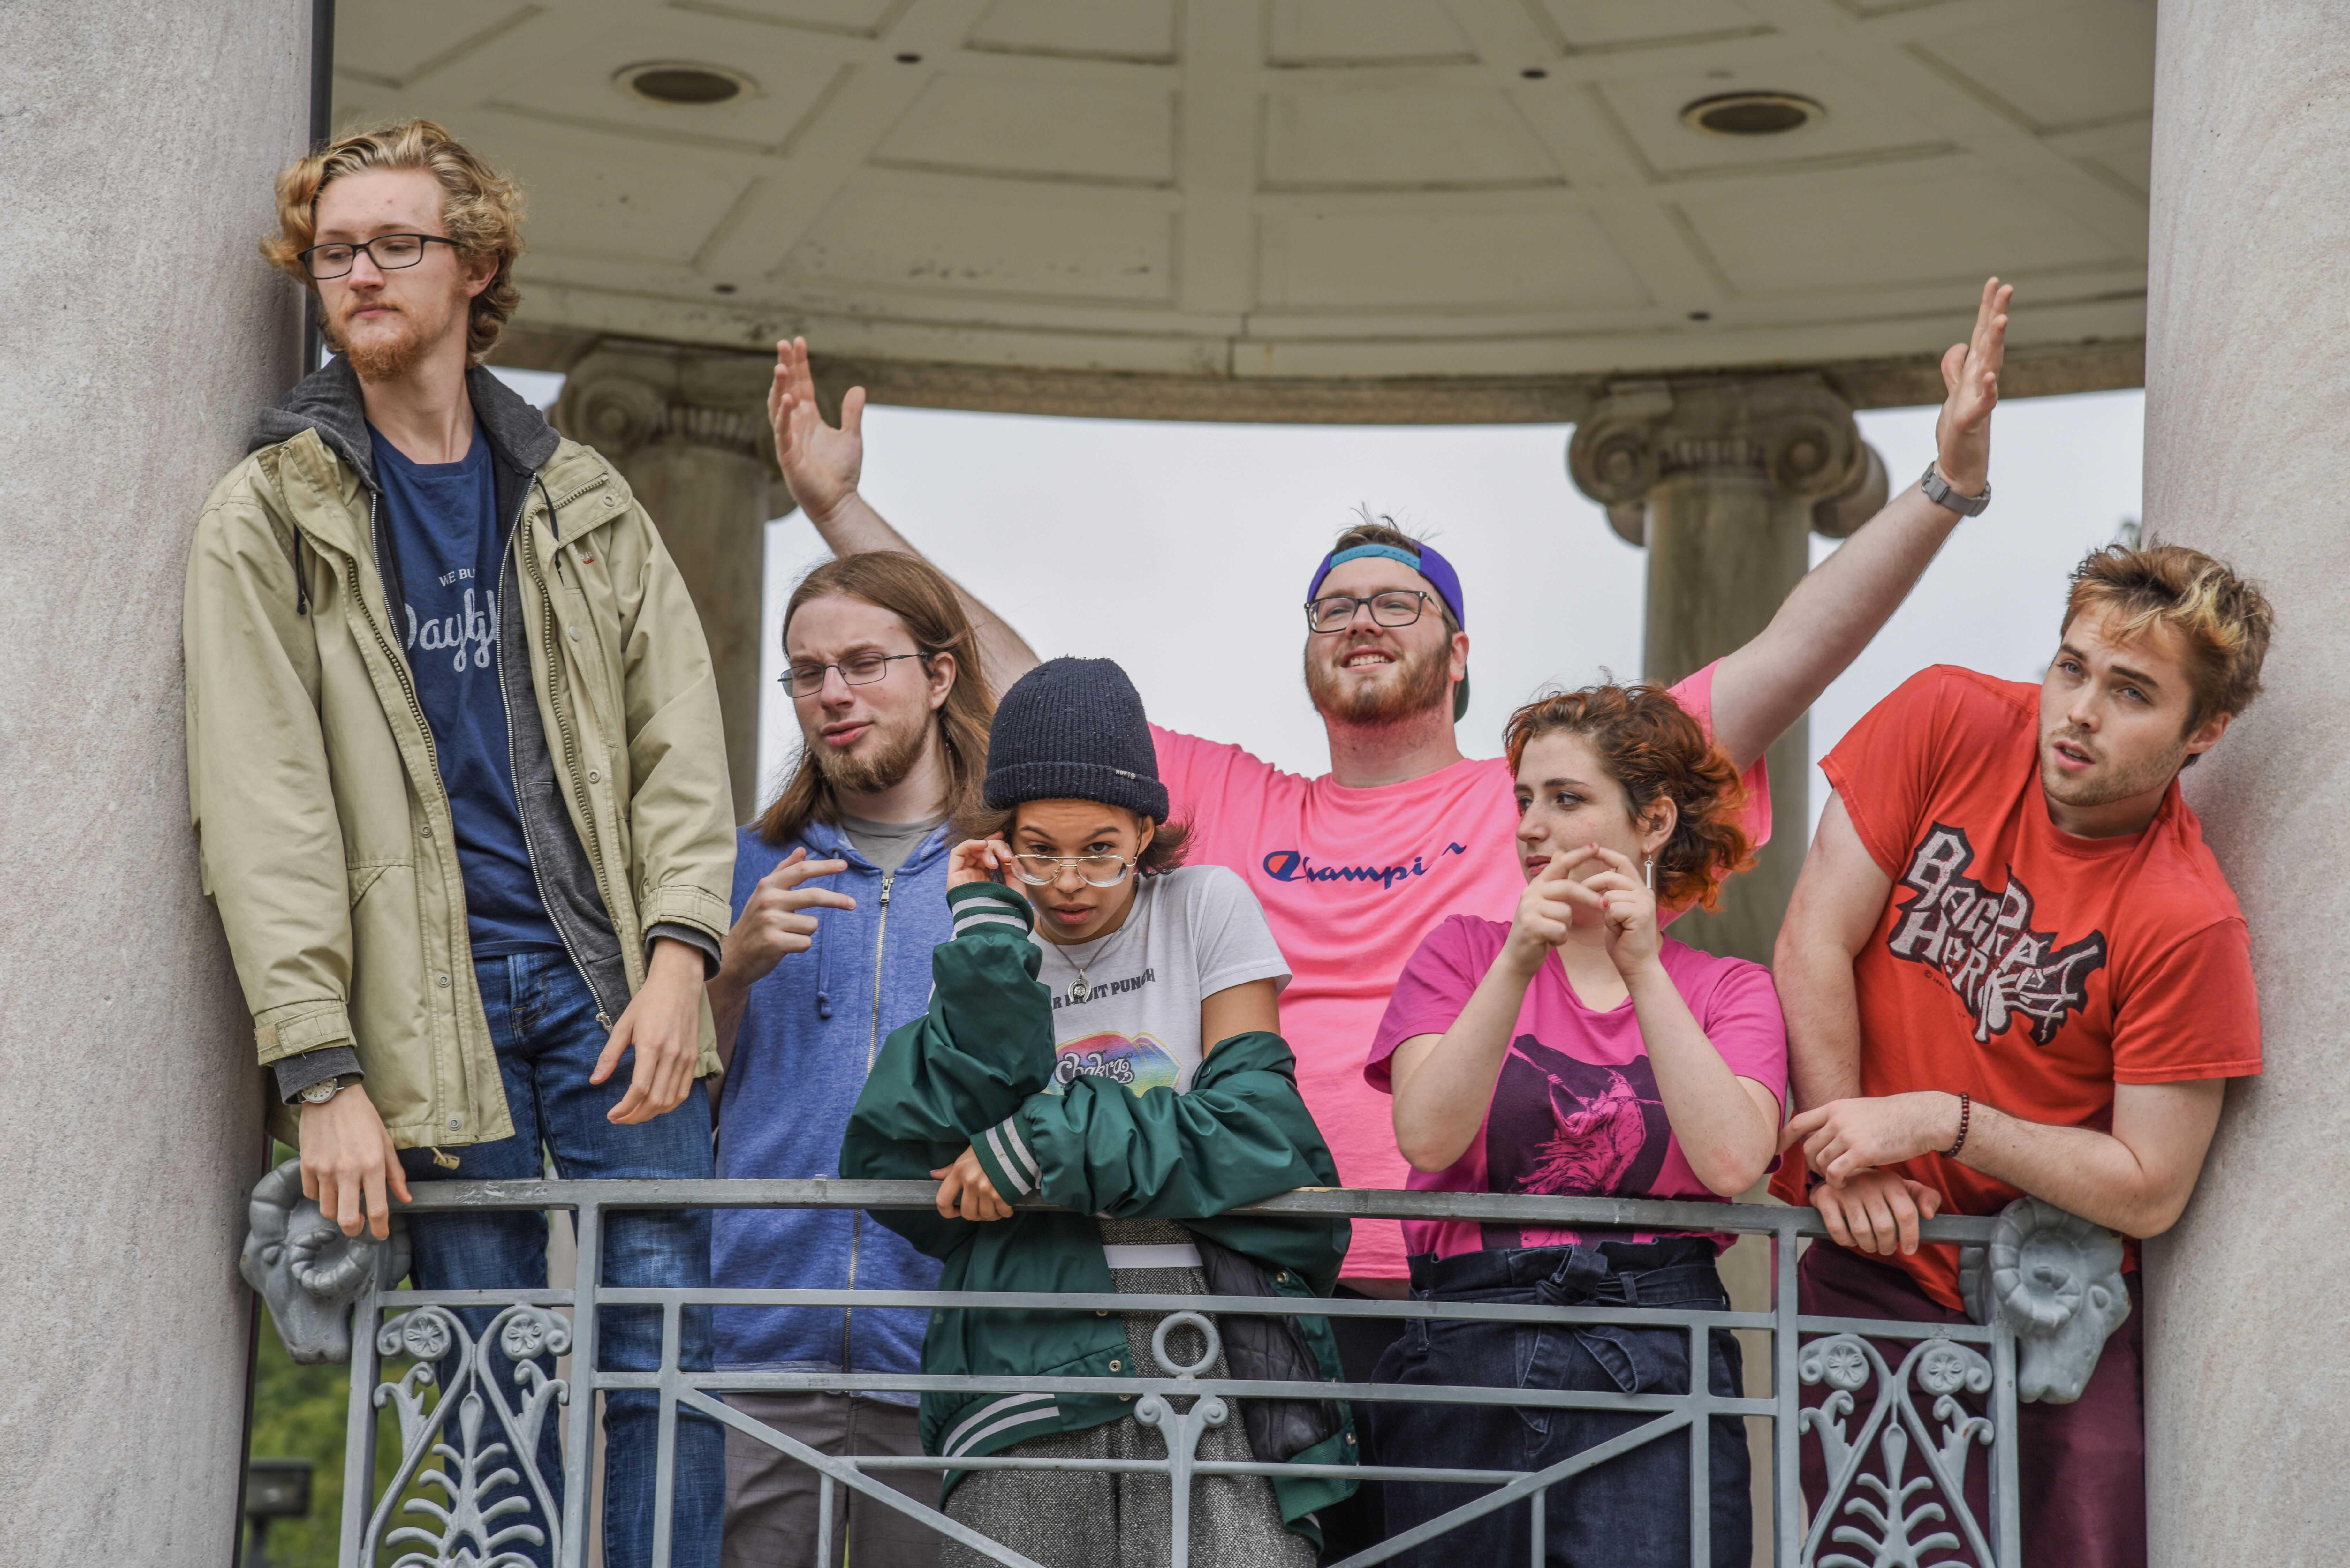 Owen Elphick (left), Dani Jean-Baptiste (front left), Devin Davis-Lorton (front right), and Trevor Kelly (left) rapped verses on the mixtape this past summer. Greyson Acquaviva / Beacon Staff